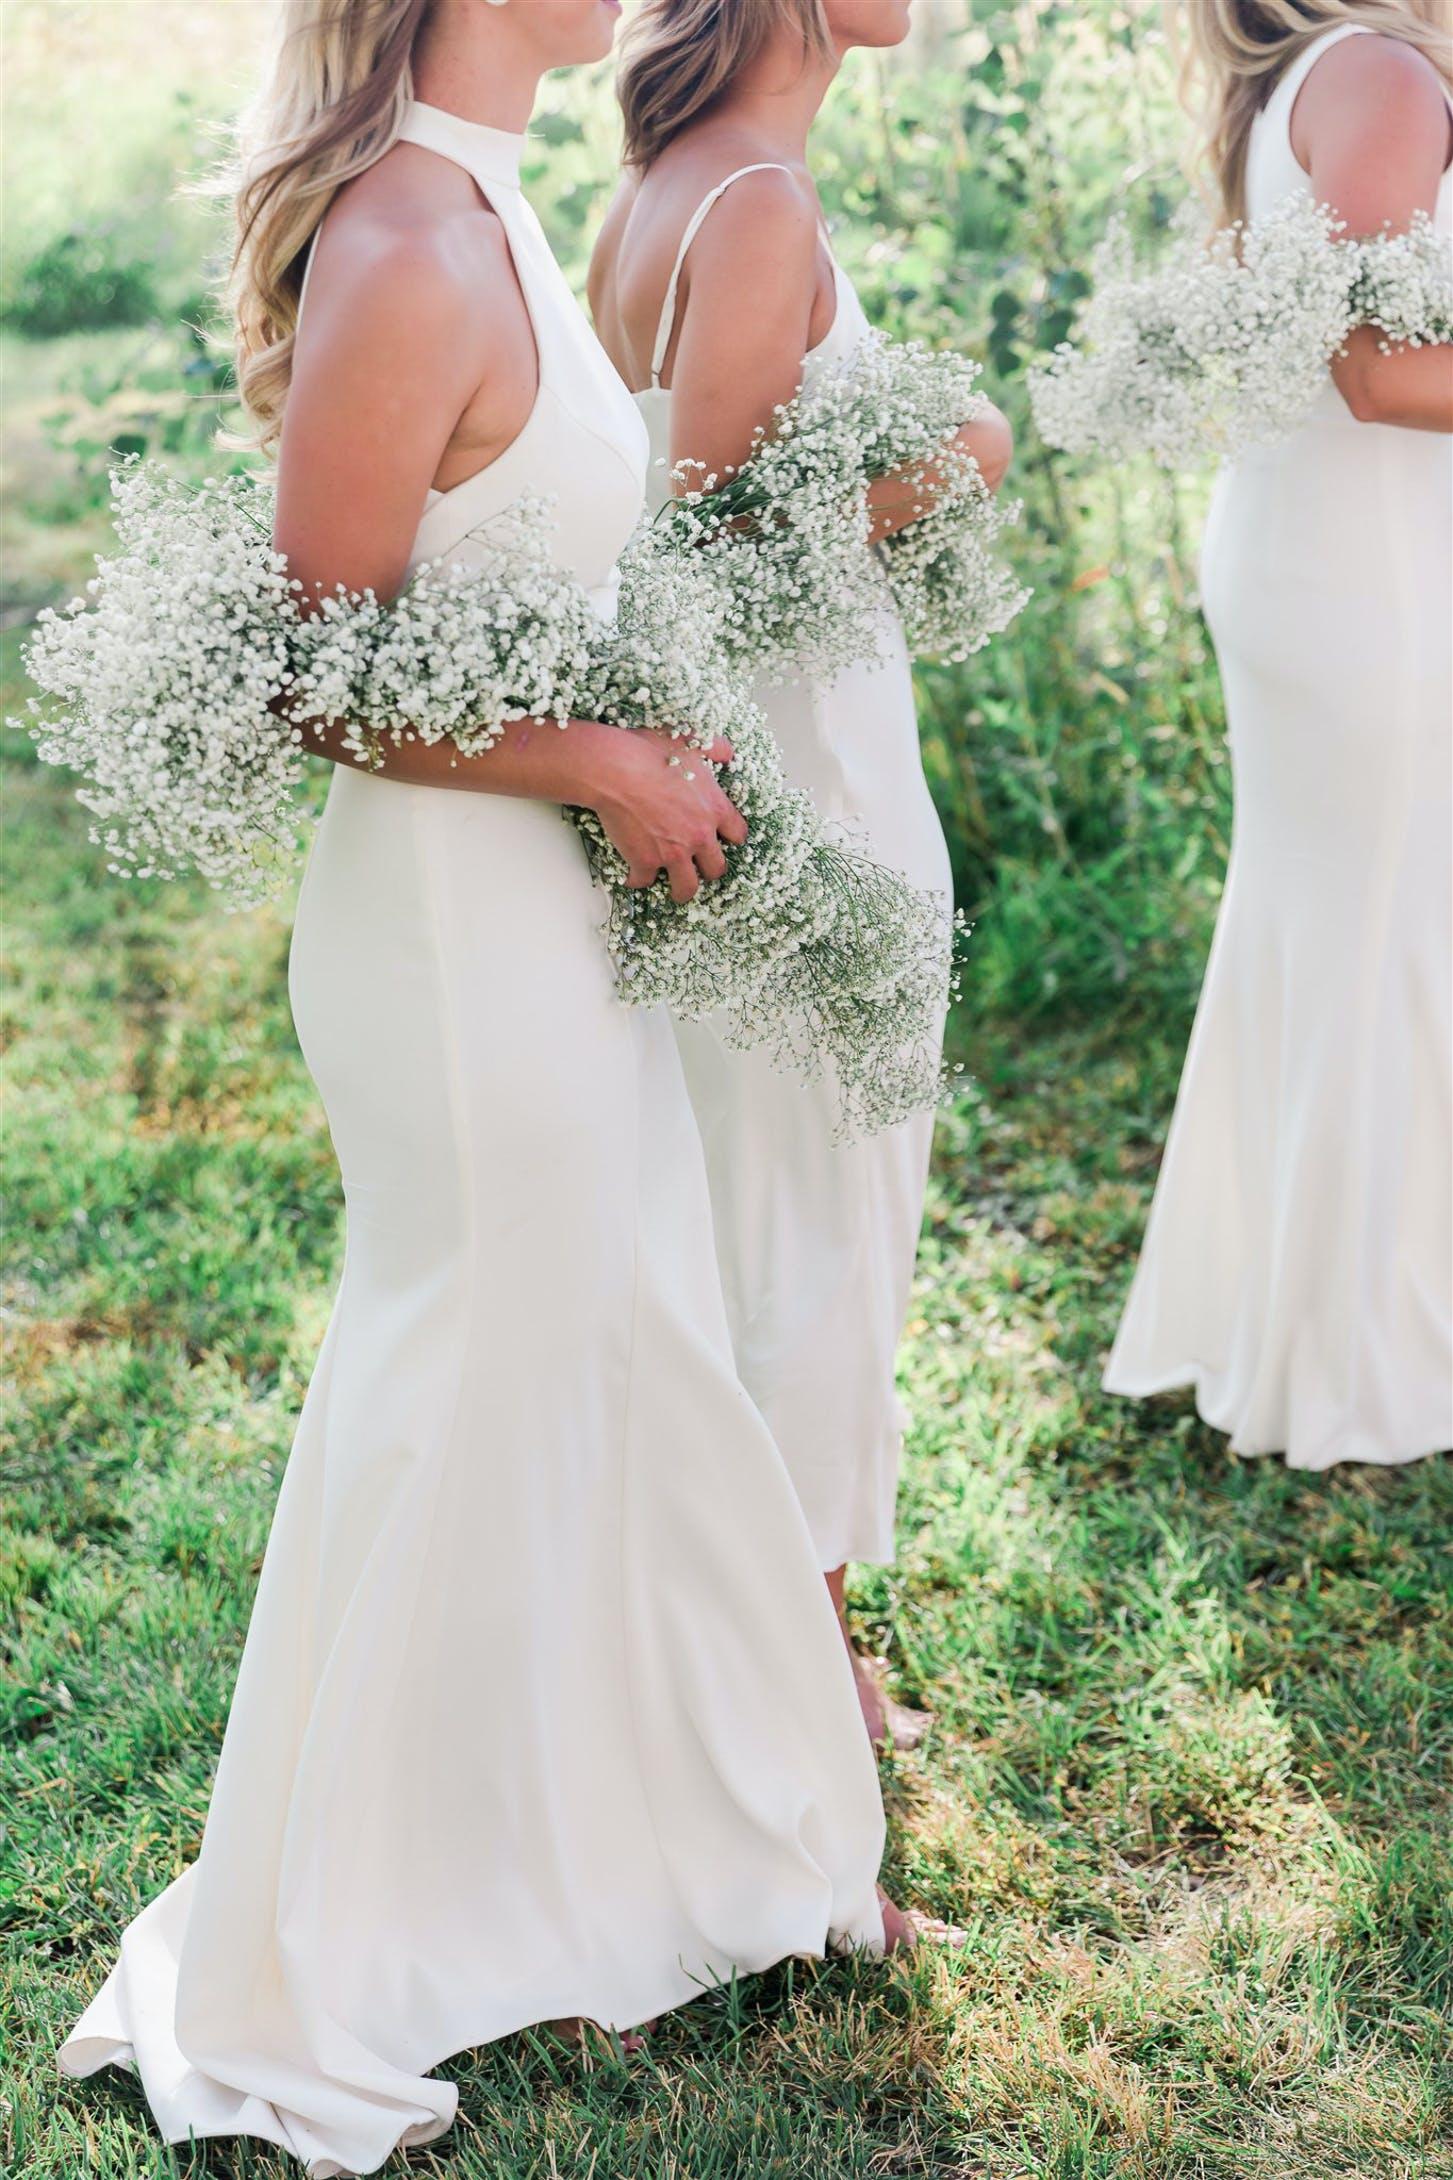 Bridesmaids in White Dresses Wear Baby's Breath Boas   PartySlate